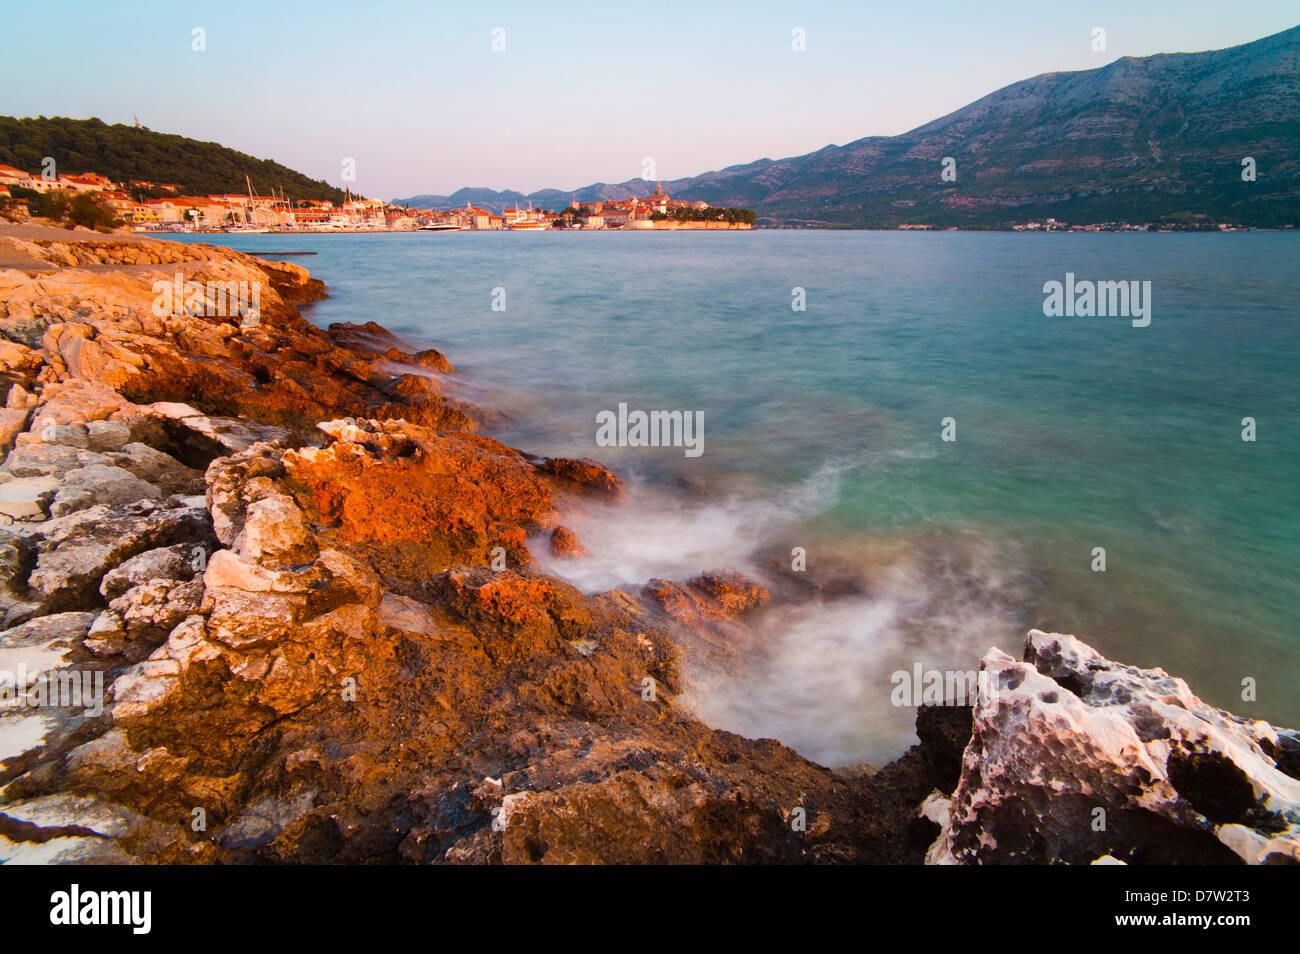 Korcula Town at sunrise, Korcula Island, Dalmatian Coast, Adriatic, Croatia - Stock Image